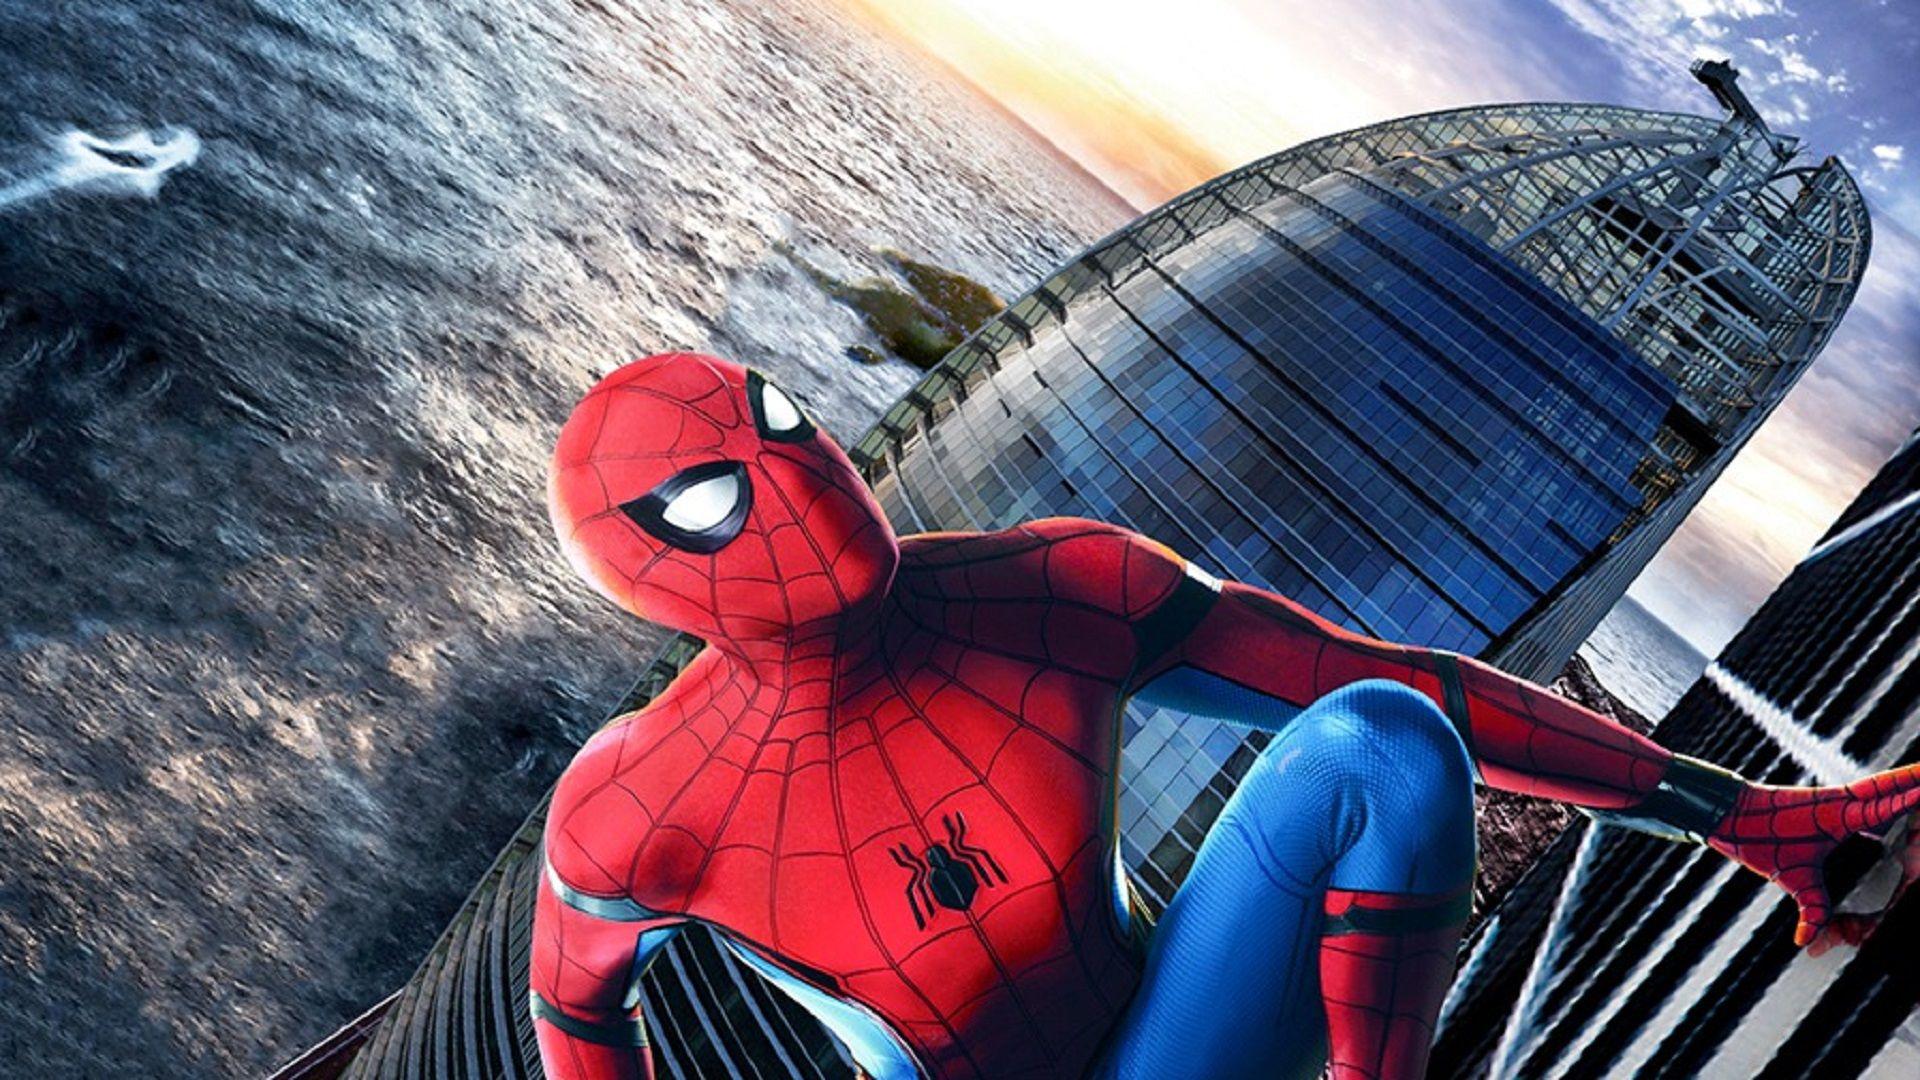 Movie Spider Man Homecoming Spider Man Hd Dubai Wallpaper Spiderman Spiderman Images Iron Man Hd Wallpaper